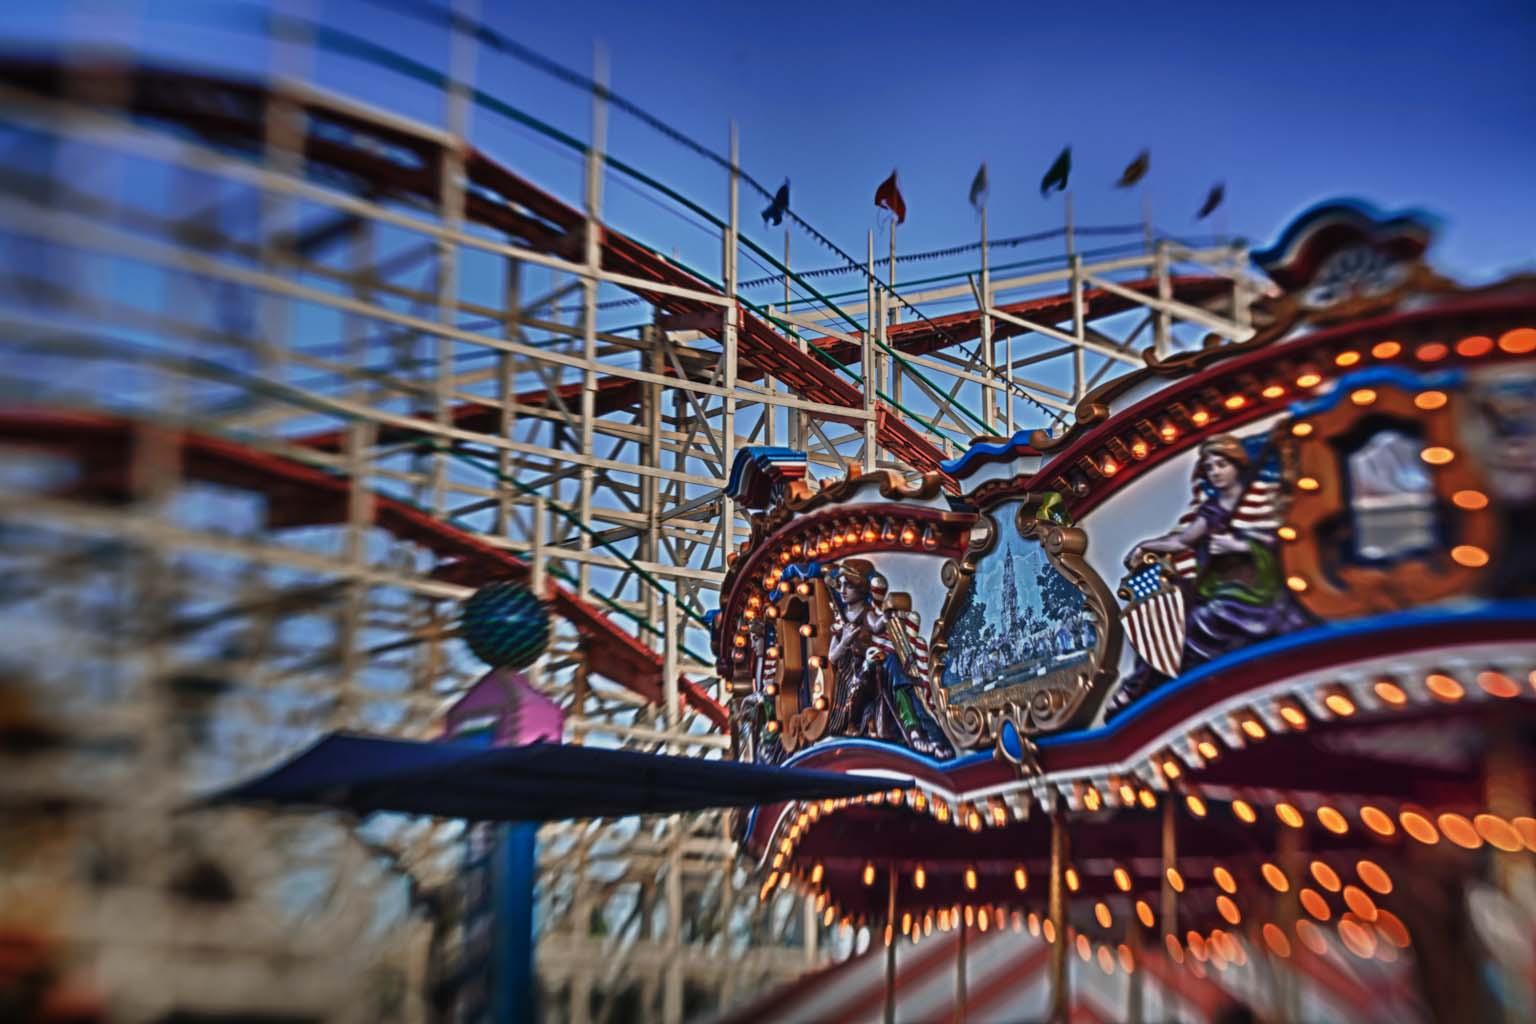 Fine-Art-Pacific-Beach-Belmont-Park-Merry-Go-Round-Roller-Coaster-HDR